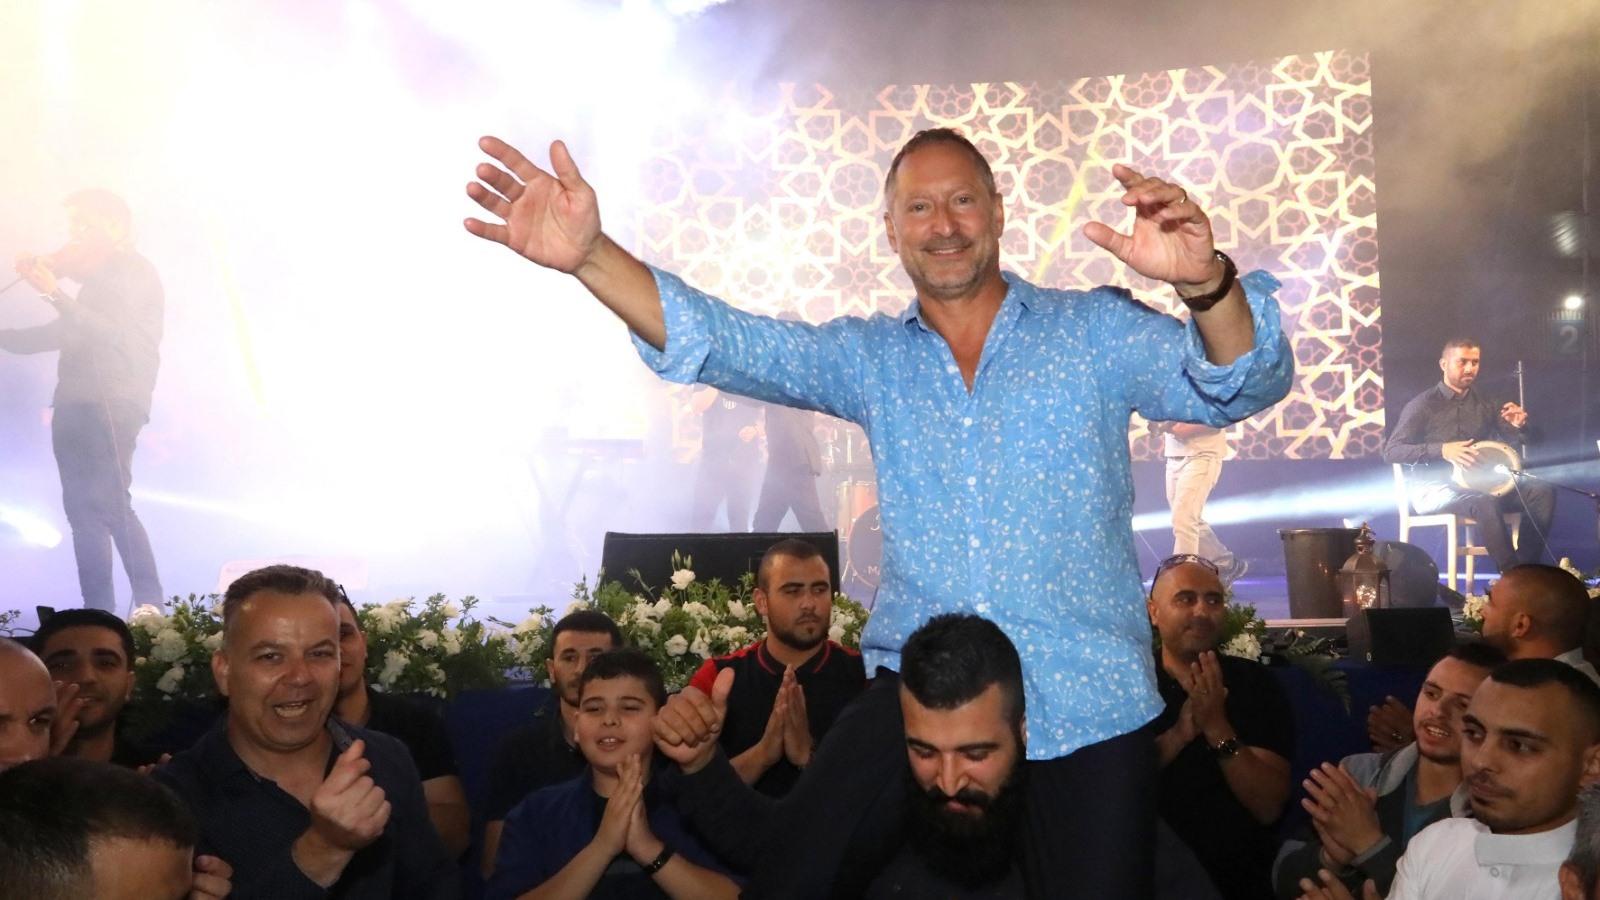 Israelis, Palestinians Share Ramadan Meal At Sodastream photo